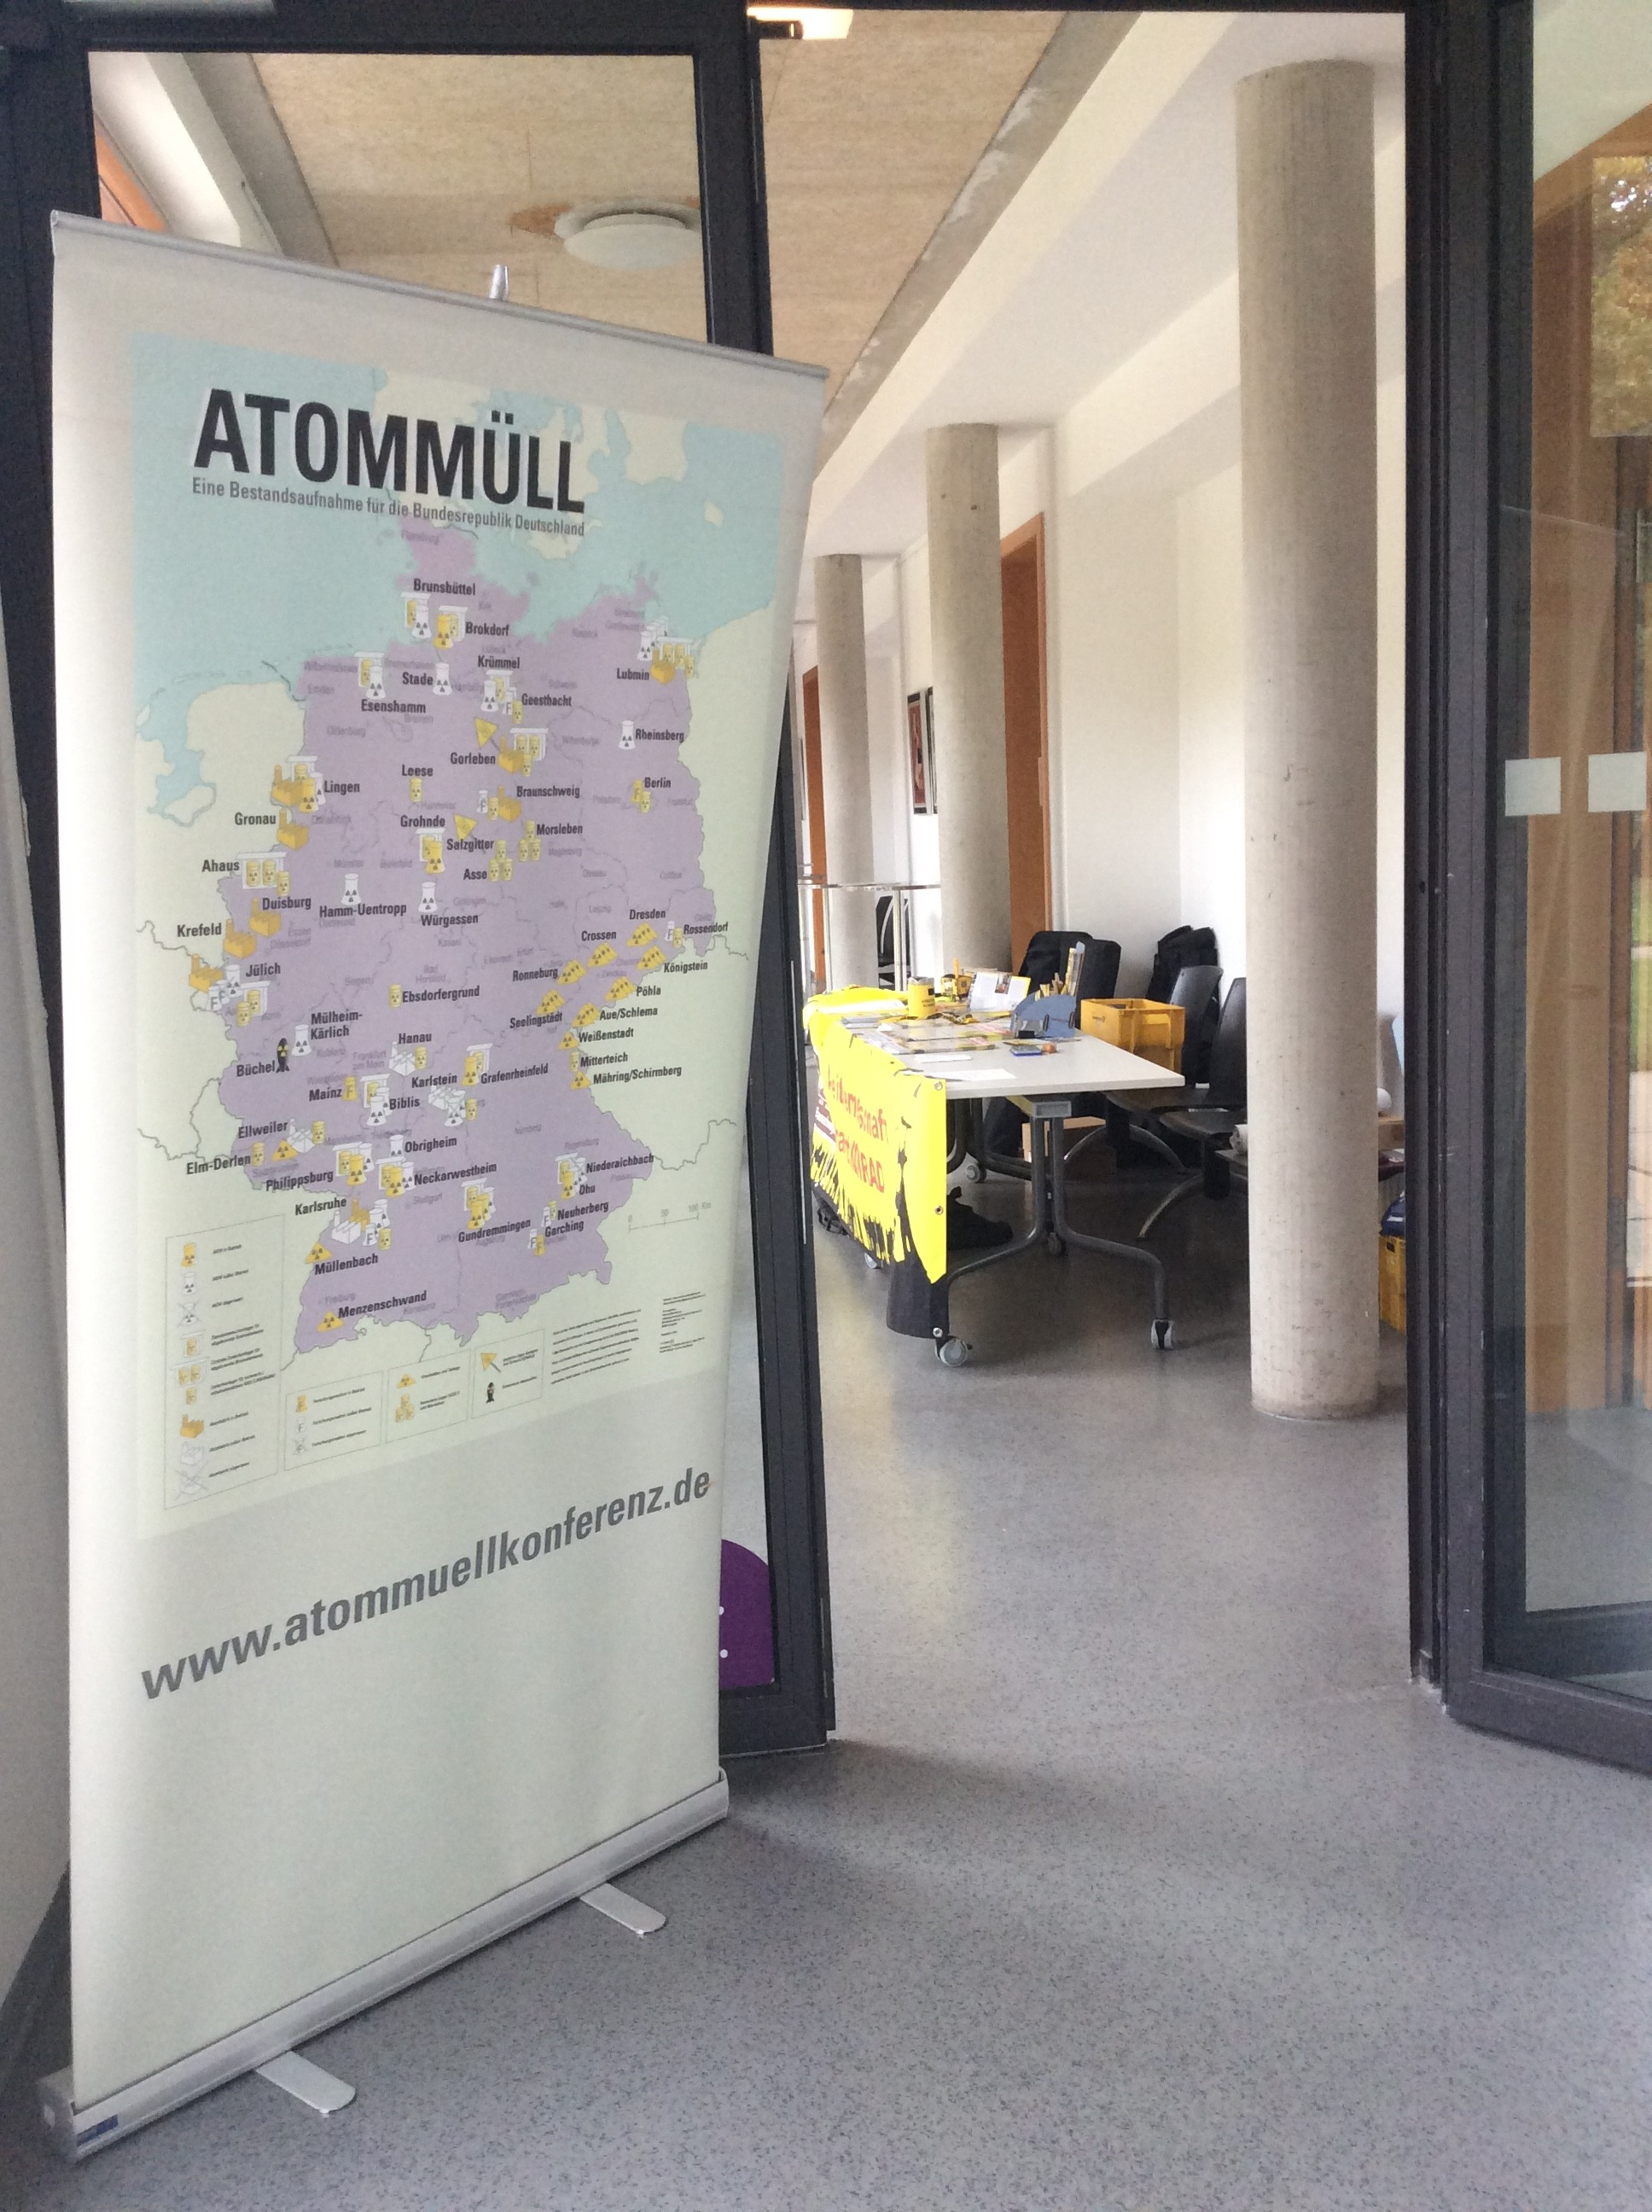 Atommüllkonferenz am 22.09.2018 in Göttingen